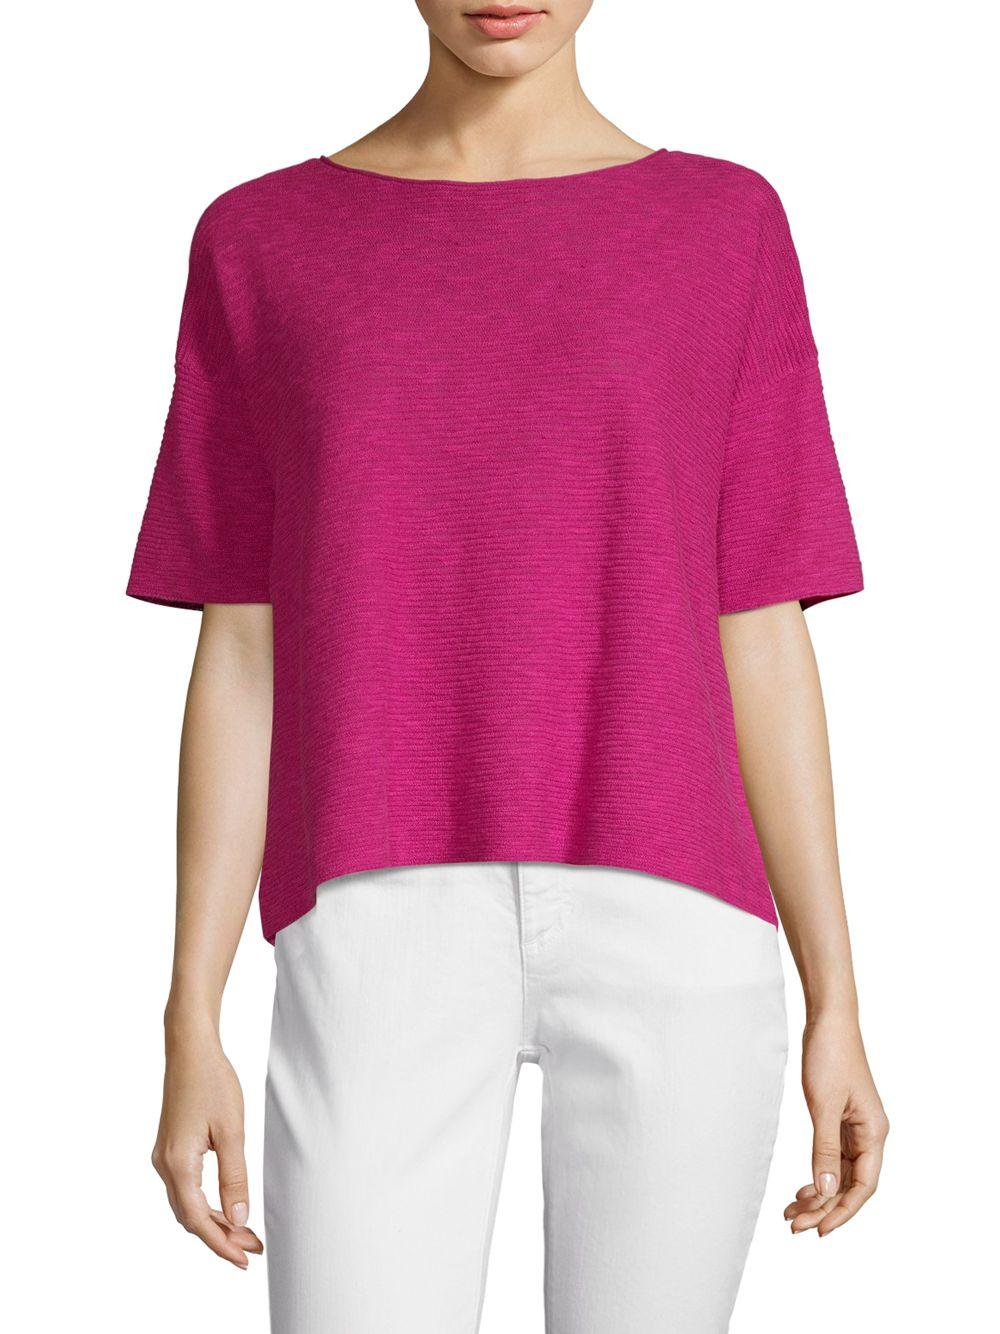 b2b0428b3ff221 Lyst - Eileen Fisher Boxy Linen Cotton Slub Knit Top in Pink - Save ...